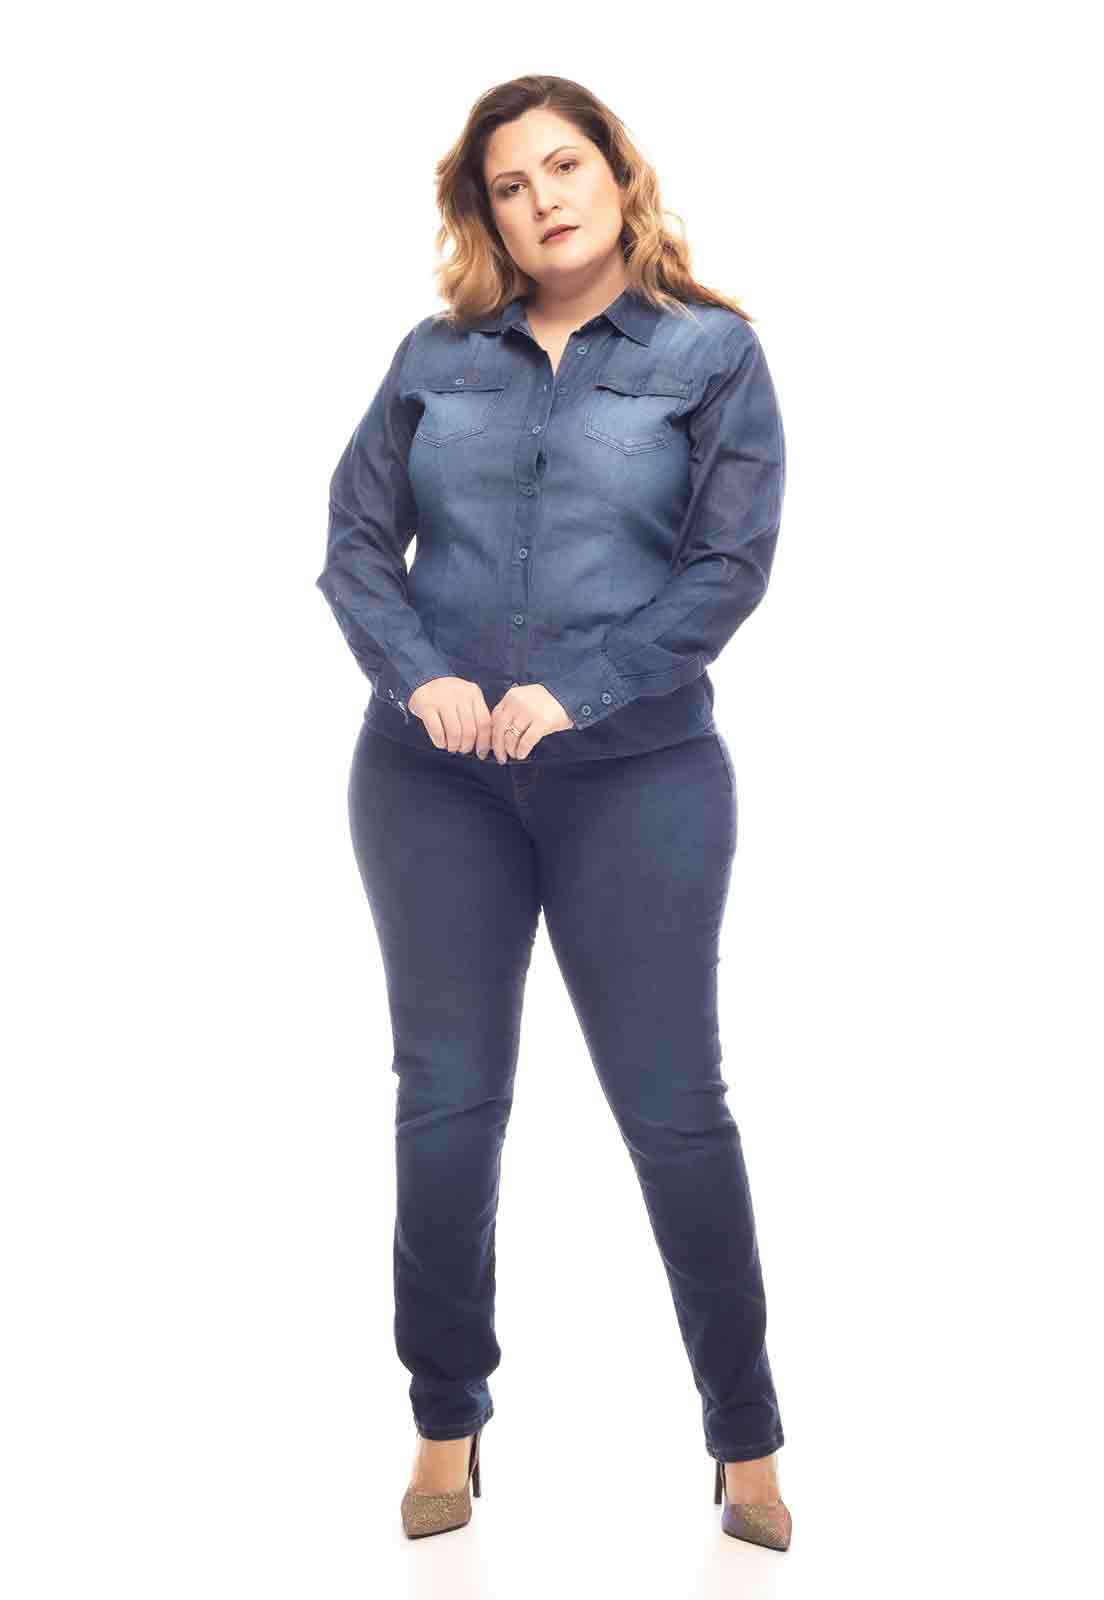 Camisa jeans escura